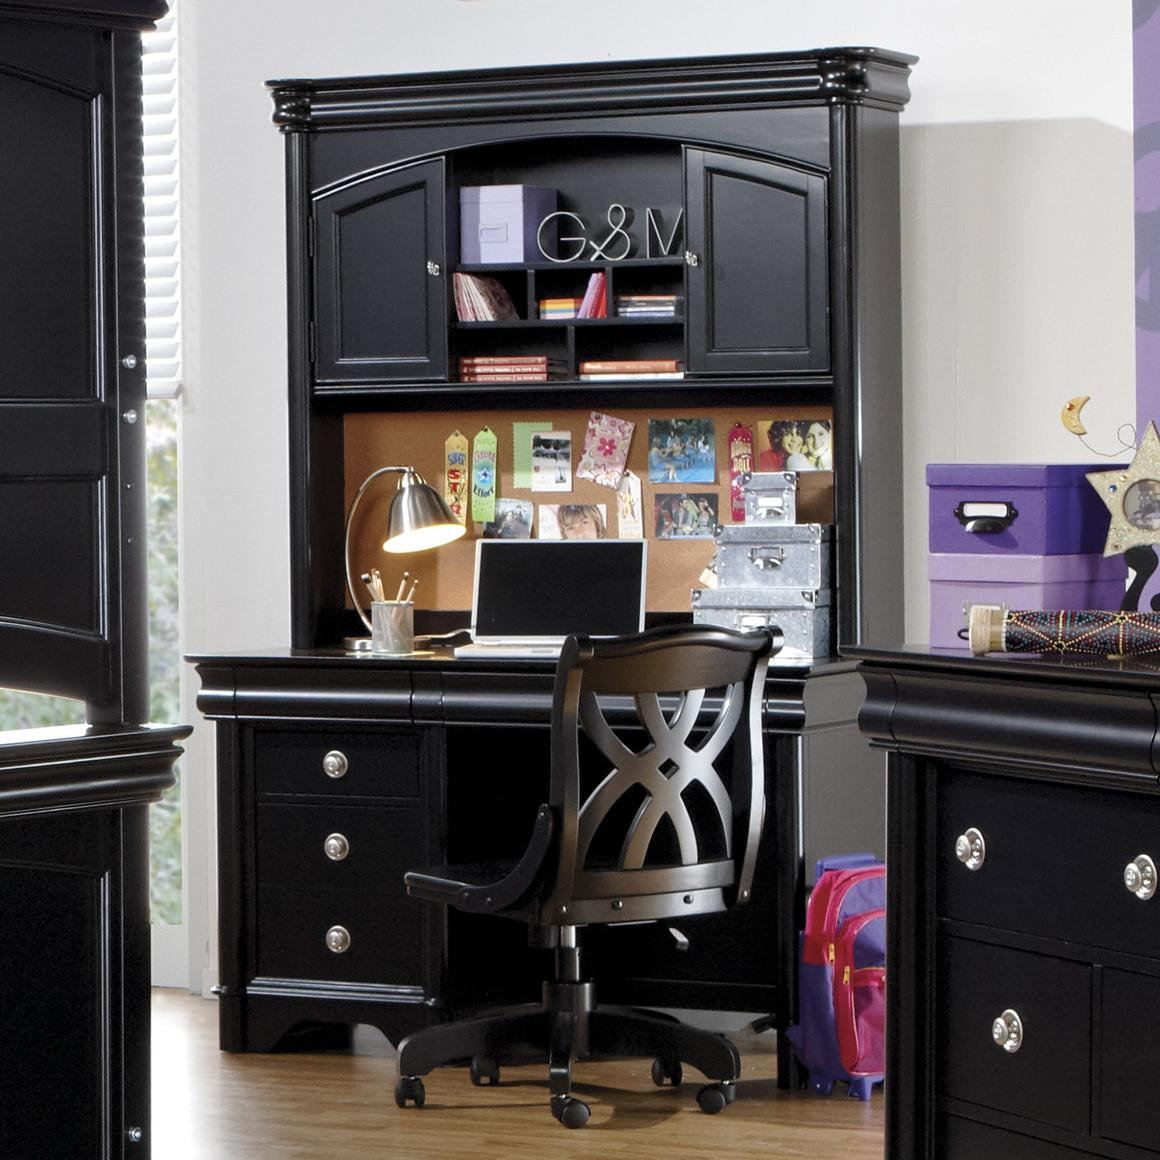 Holland House Petite Louis 2 Black Computer Pedestal Desk Hutch Fmg Local Home Furnishing Desk Hutch